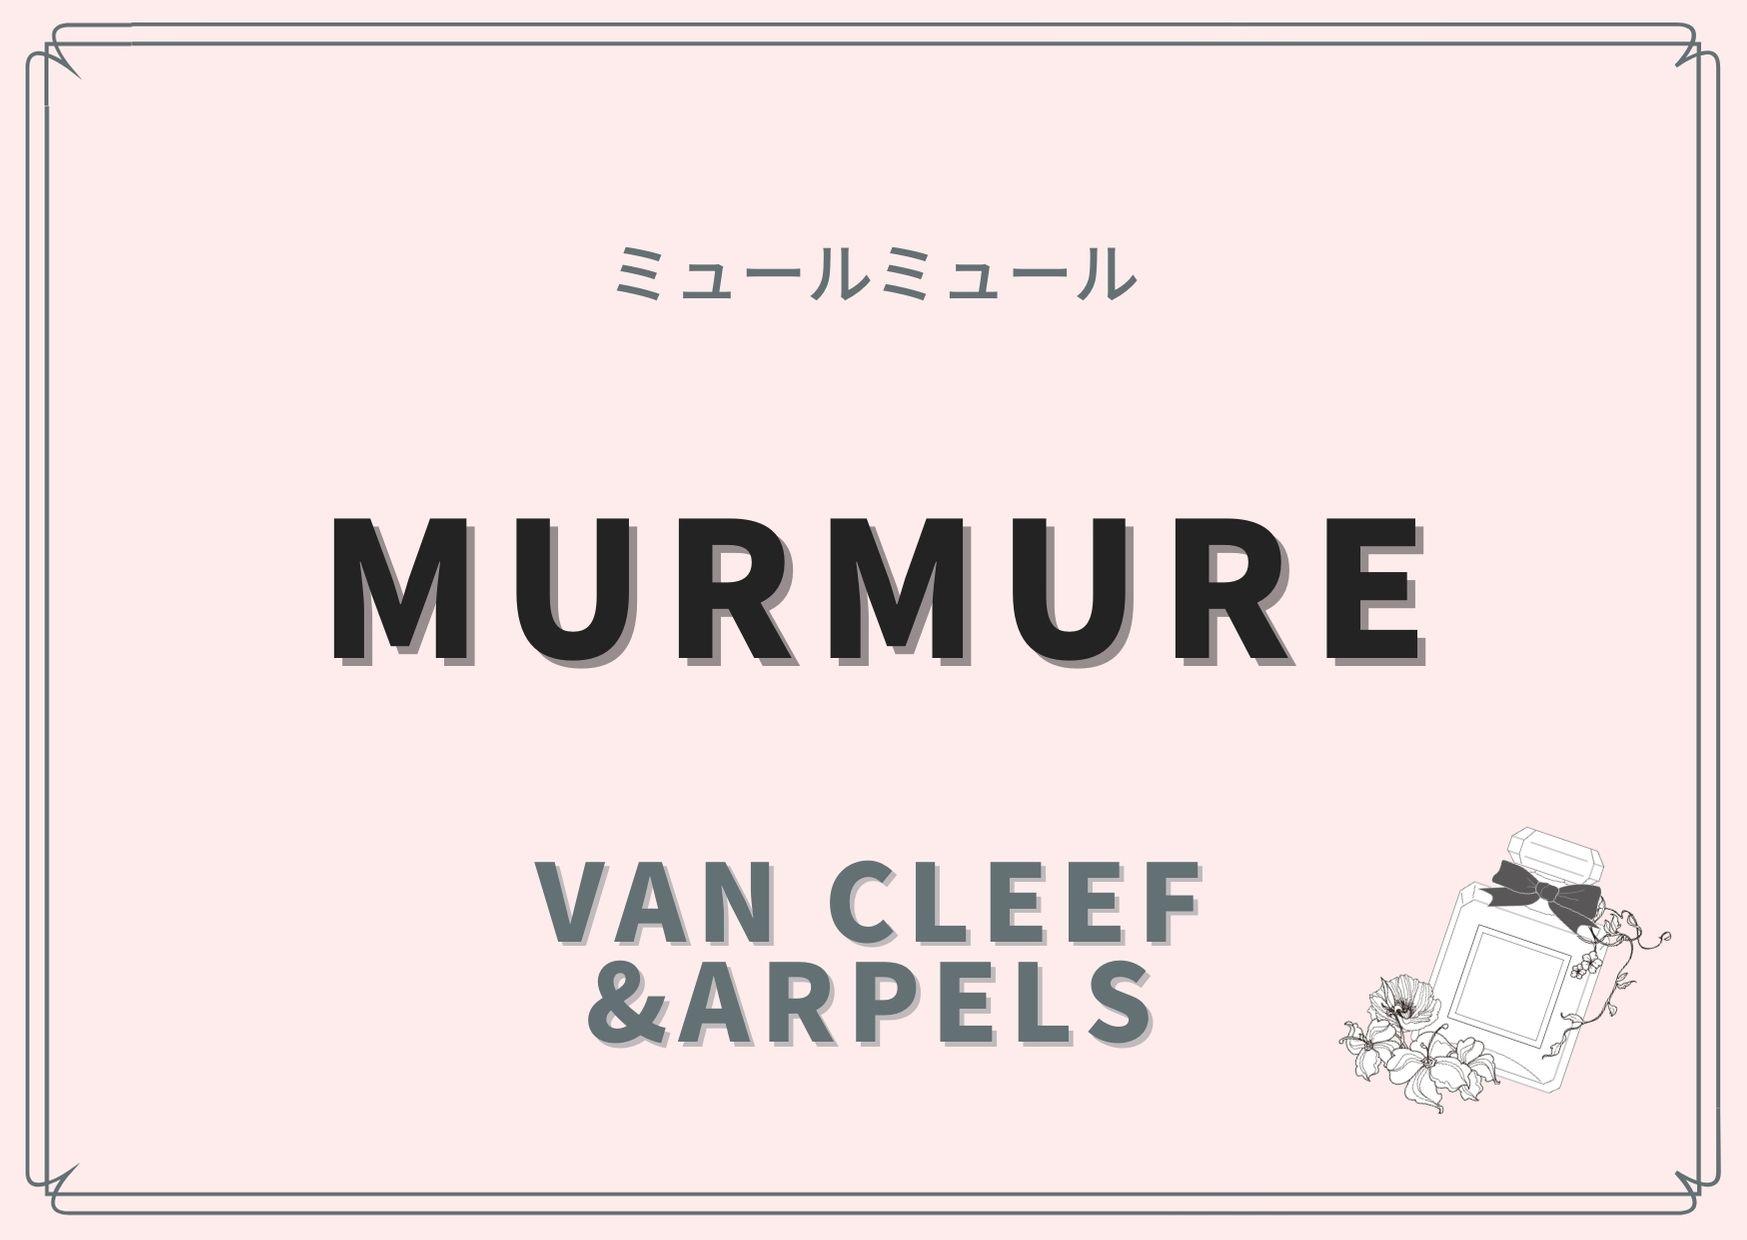 Murmure(ミュールミュール)/Van Cleef&Arpels(ヴァン クリーフ&アーペル)